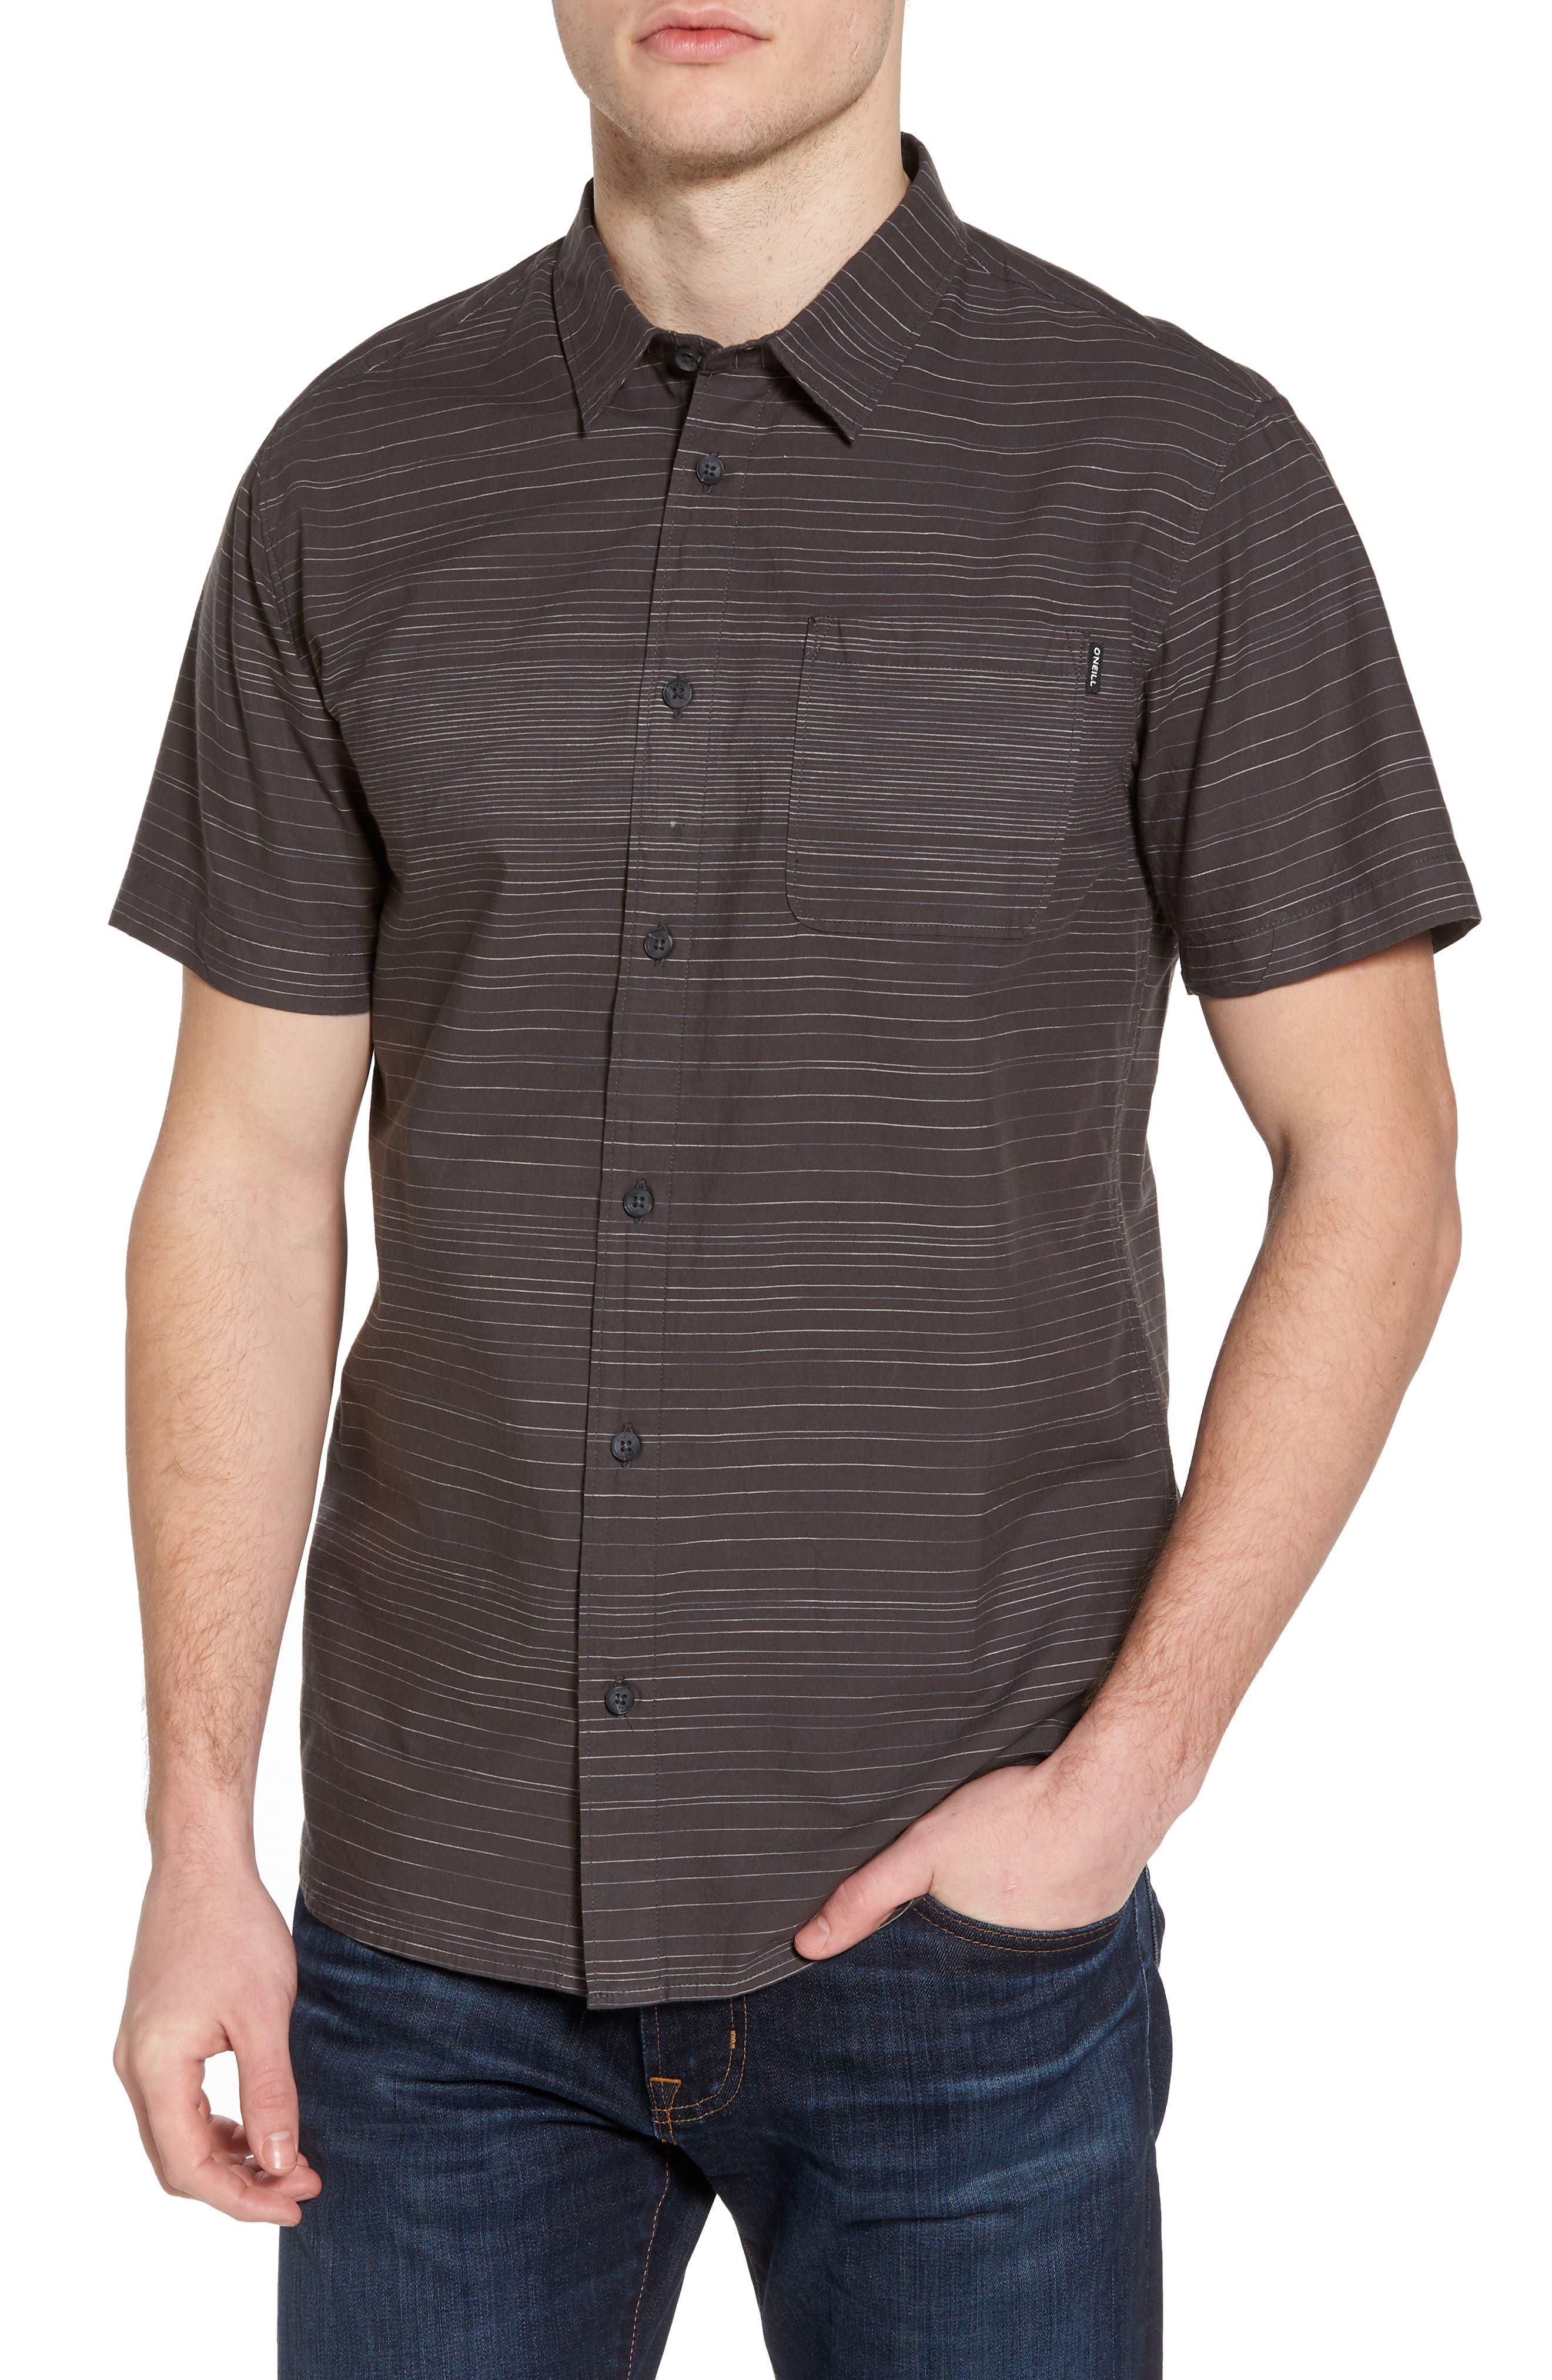 Hound Woven Shirt,                             Main thumbnail 1, color,                             Asphalt